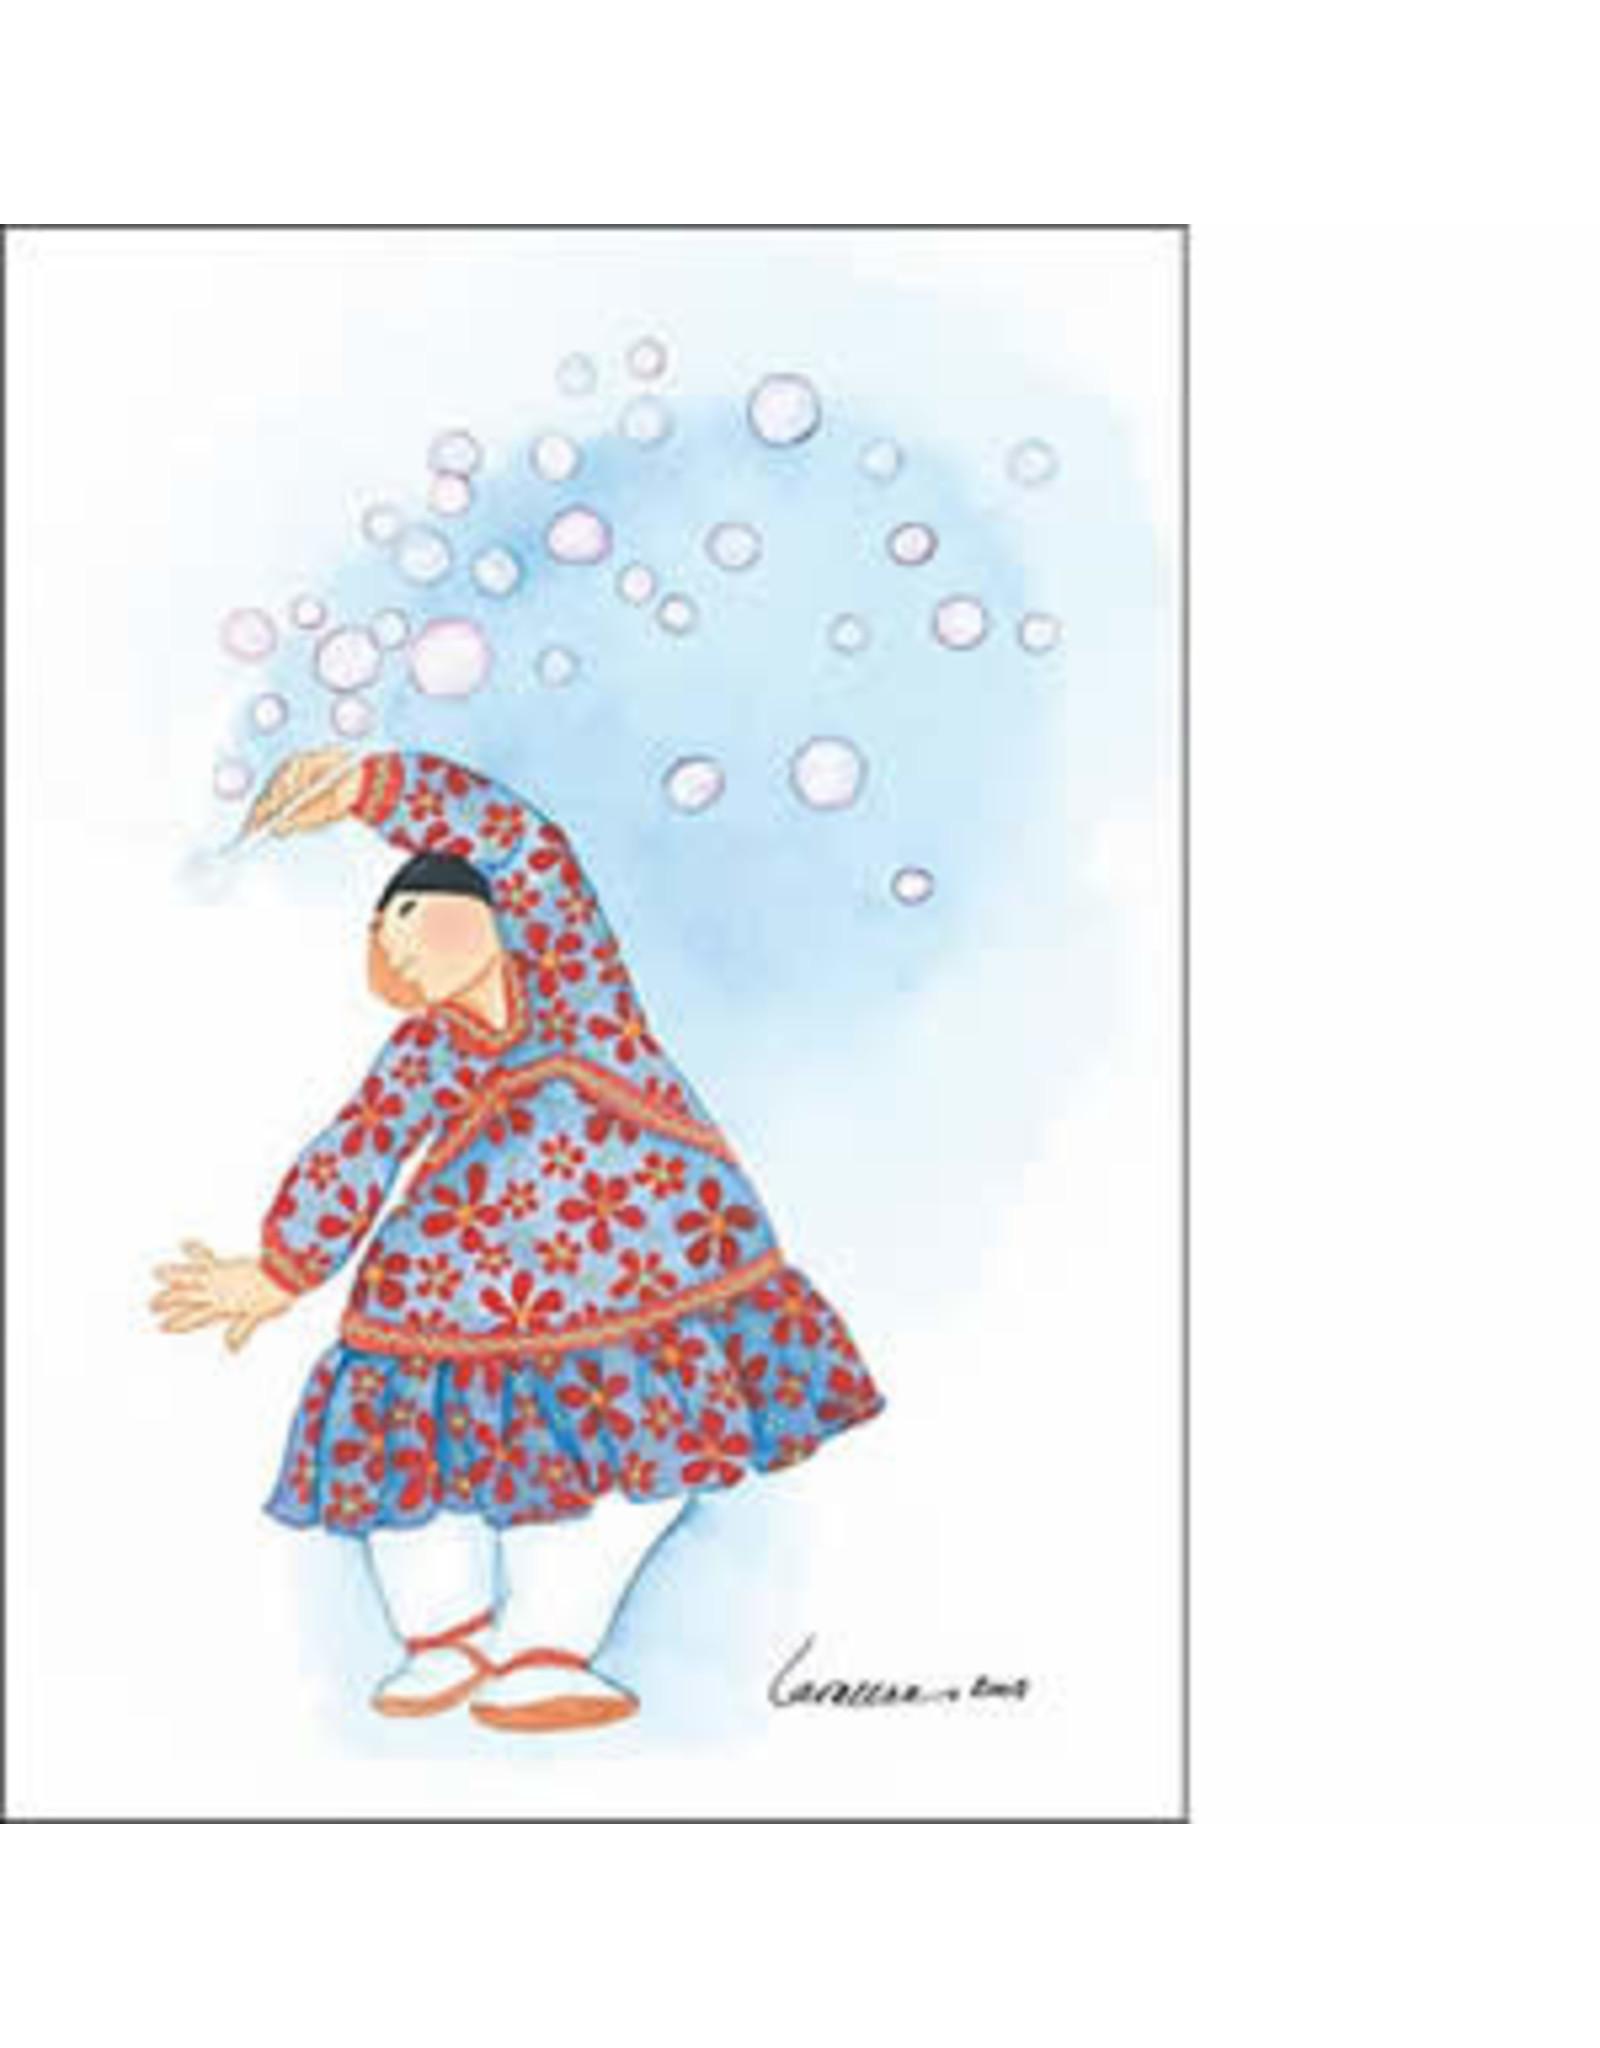 Barbara Lavallee Painting the Sky | Barbara Lavallee